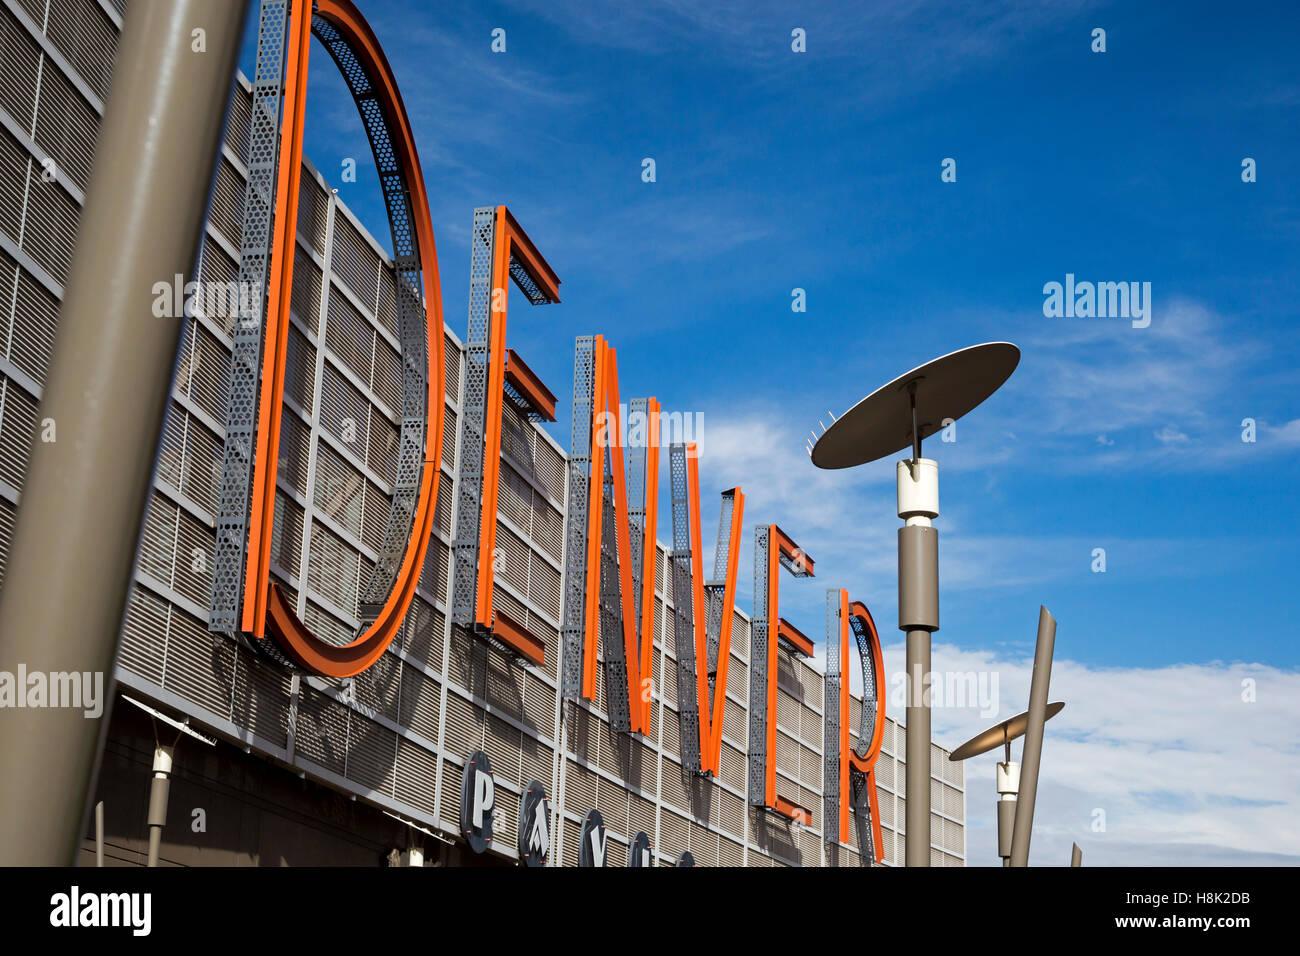 Denver, Colorado - A sign on the Denver Pavilions shopping mall. - Stock Image